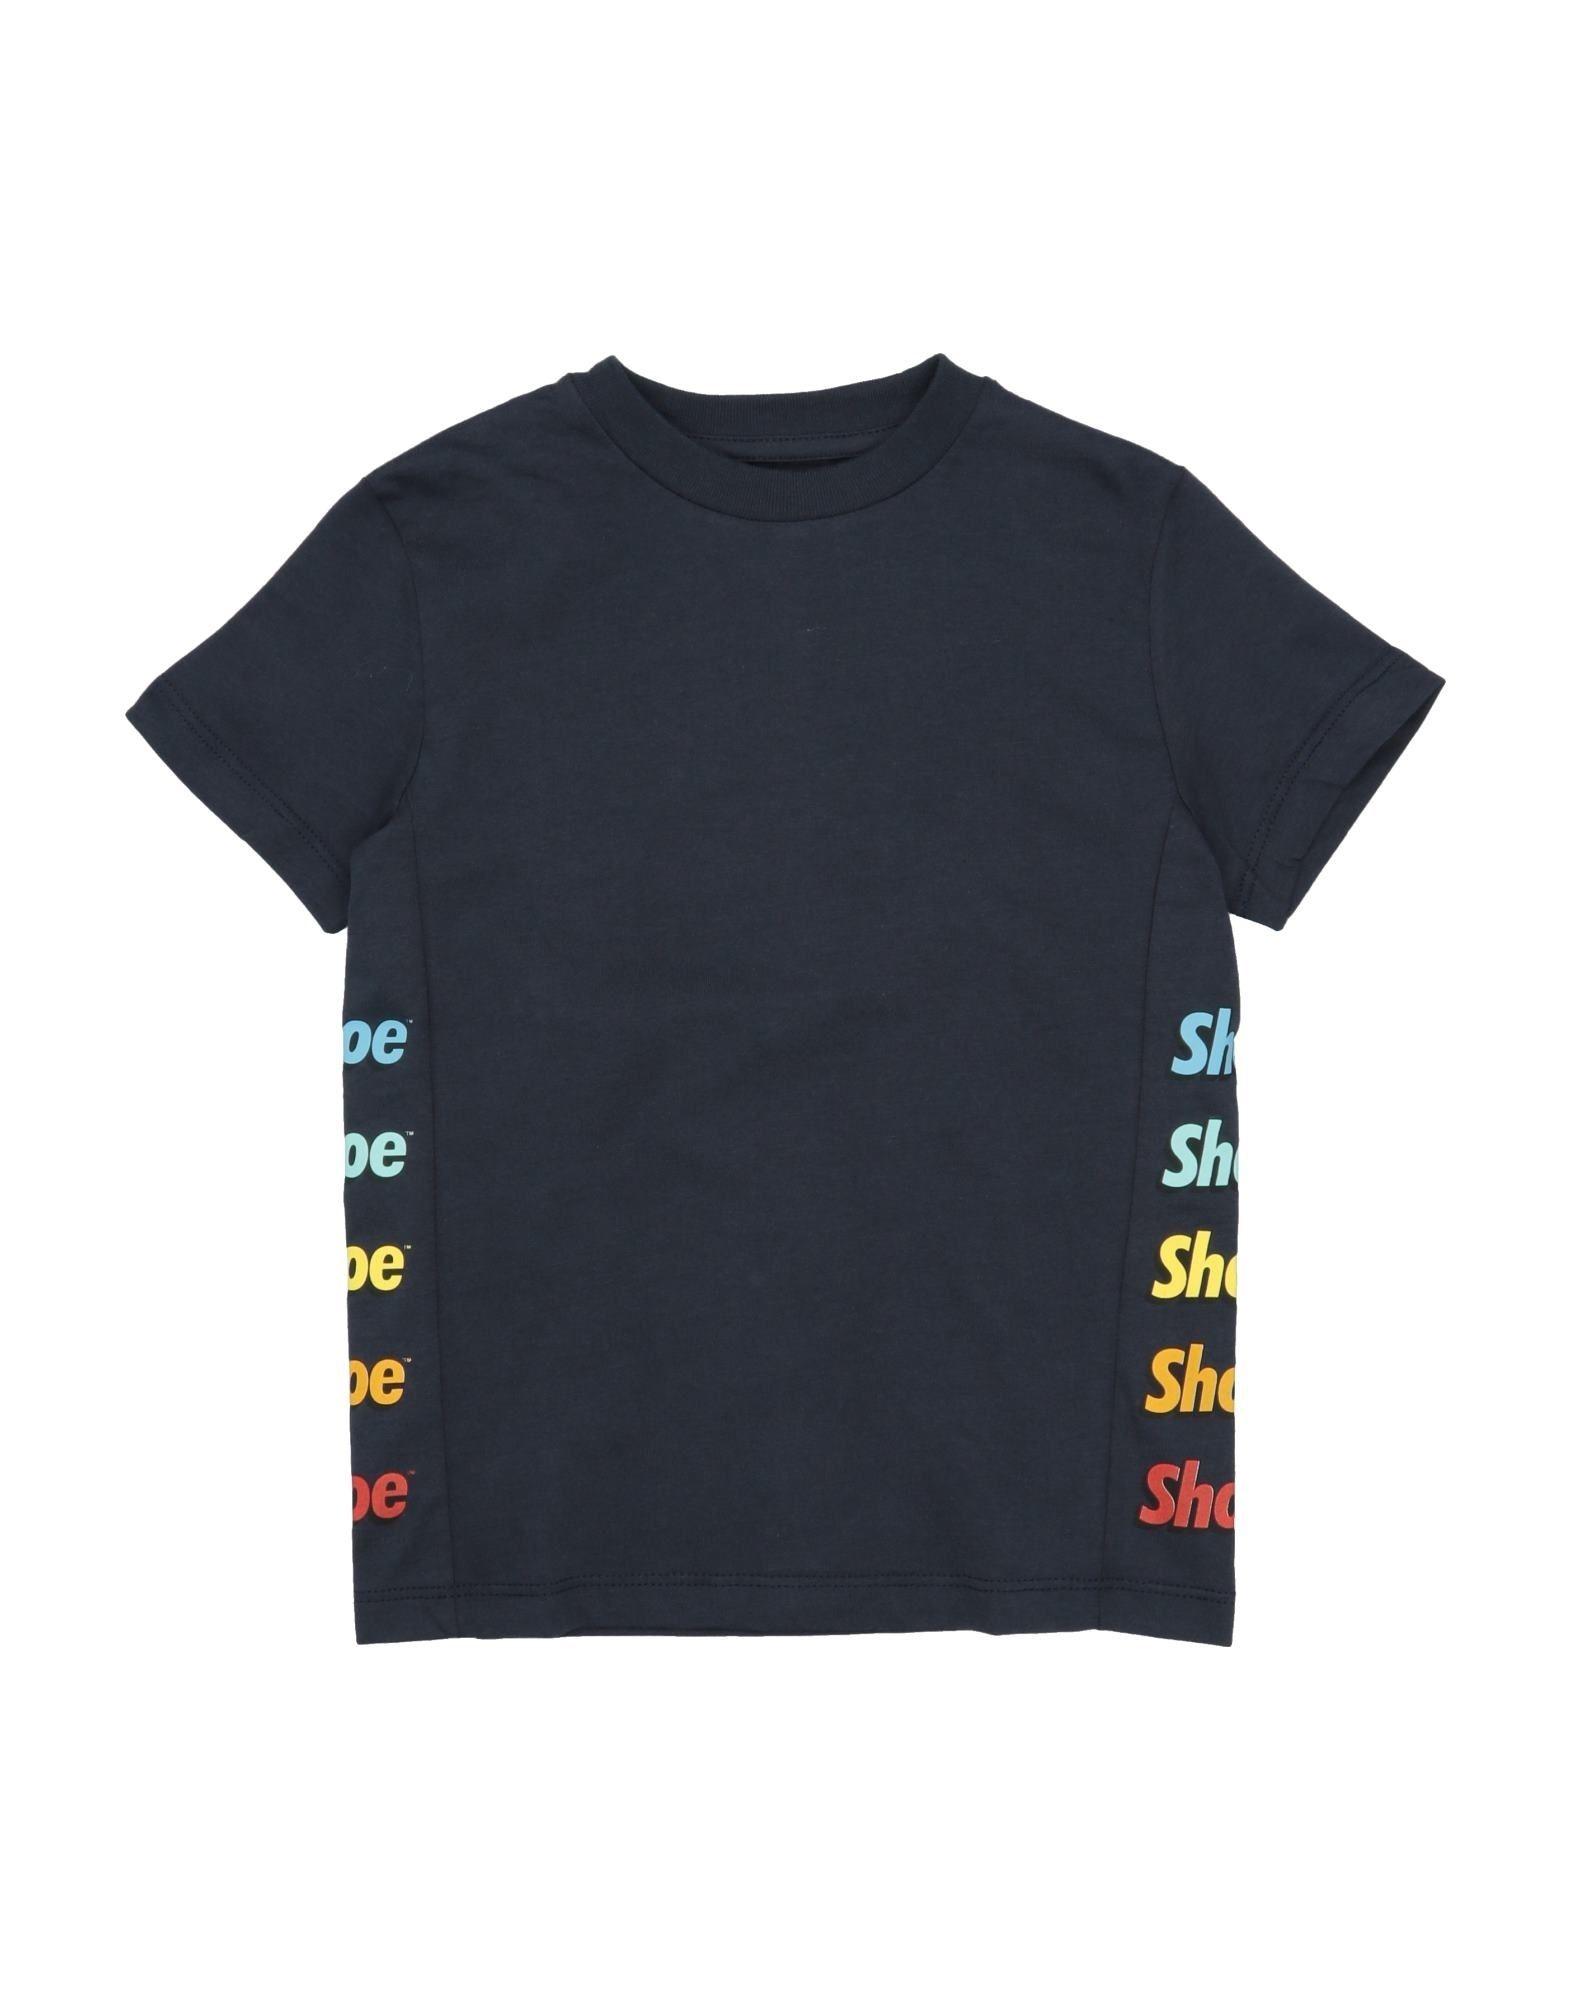 Shoeshine Kids' T-shirts In Dark Blue